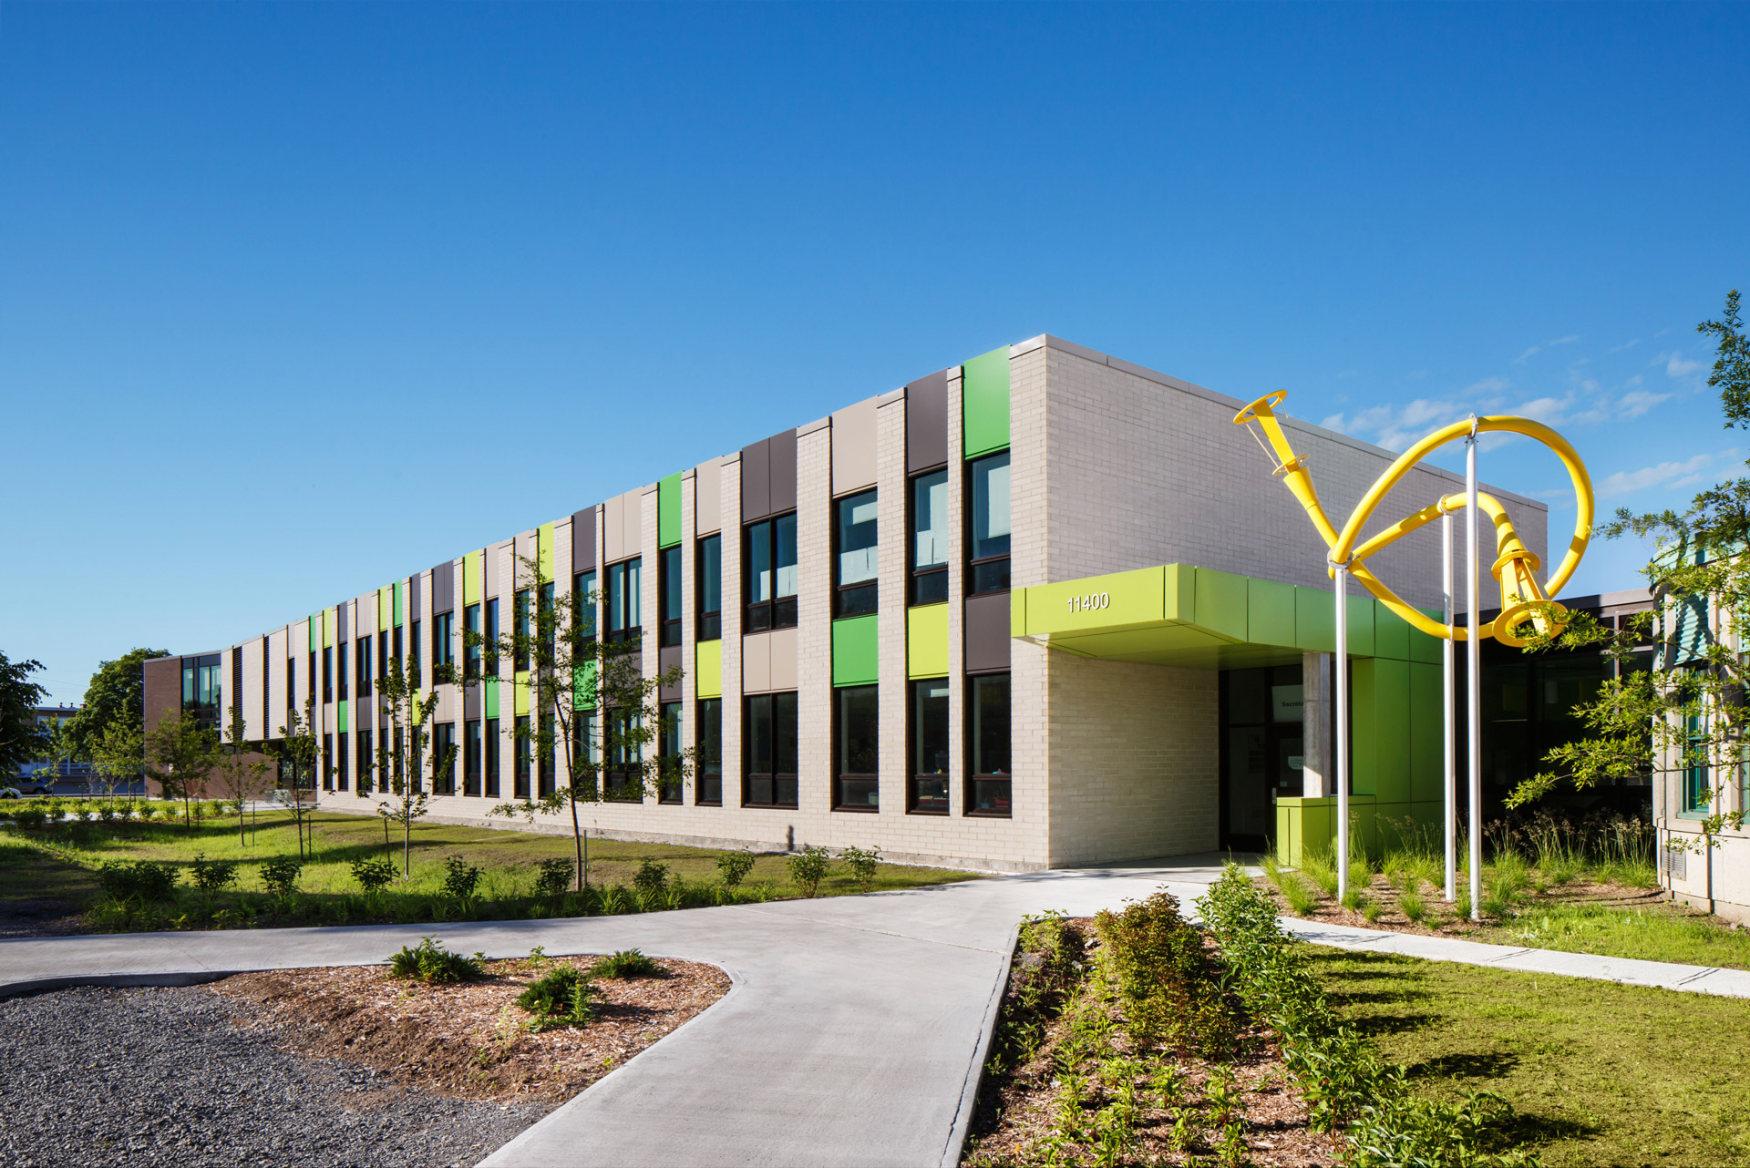 Gilles-Vigneault elementary school